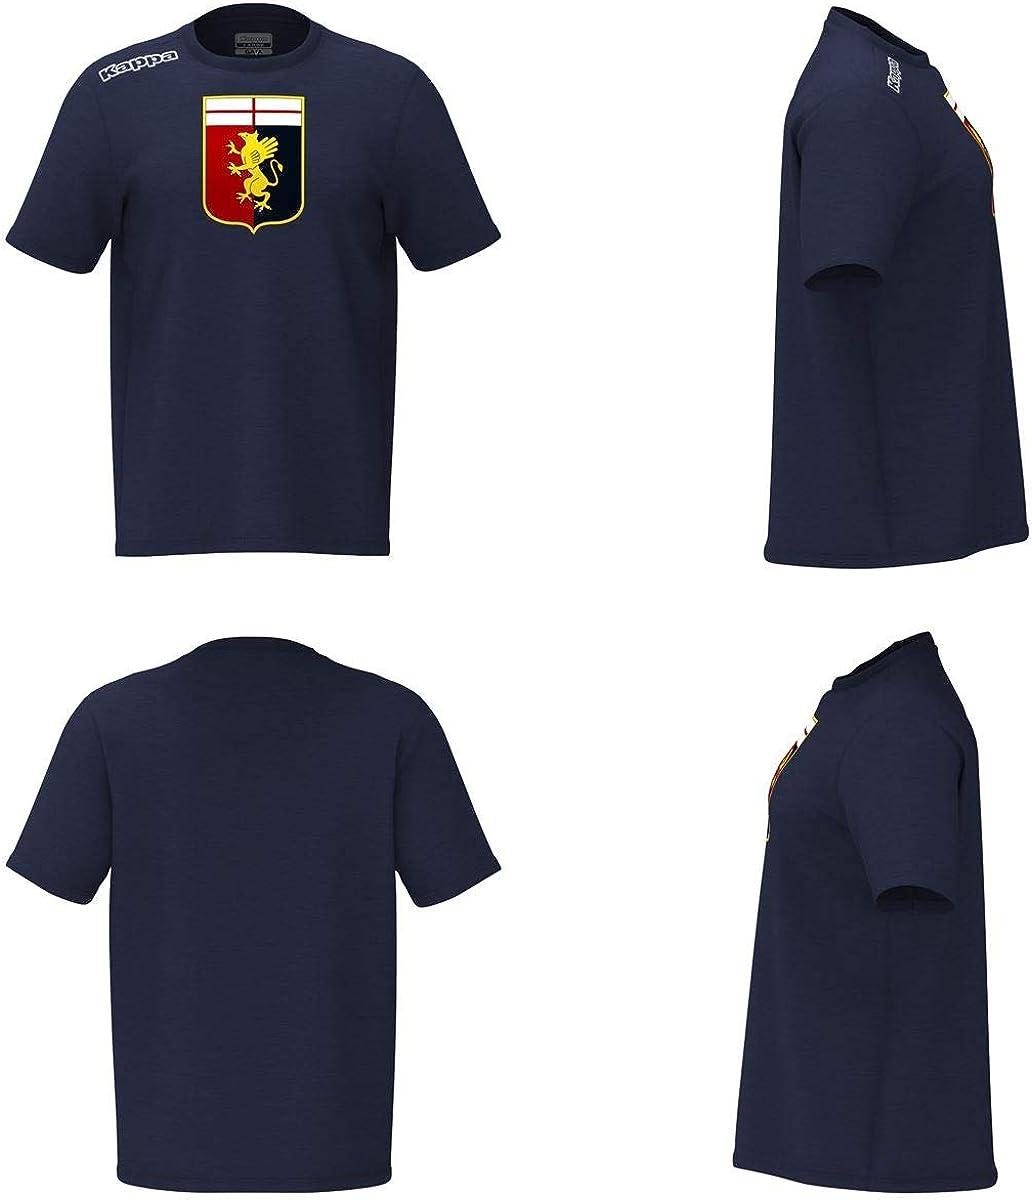 Kappa T-Shirt Logo Genoa Grande 14 Anni